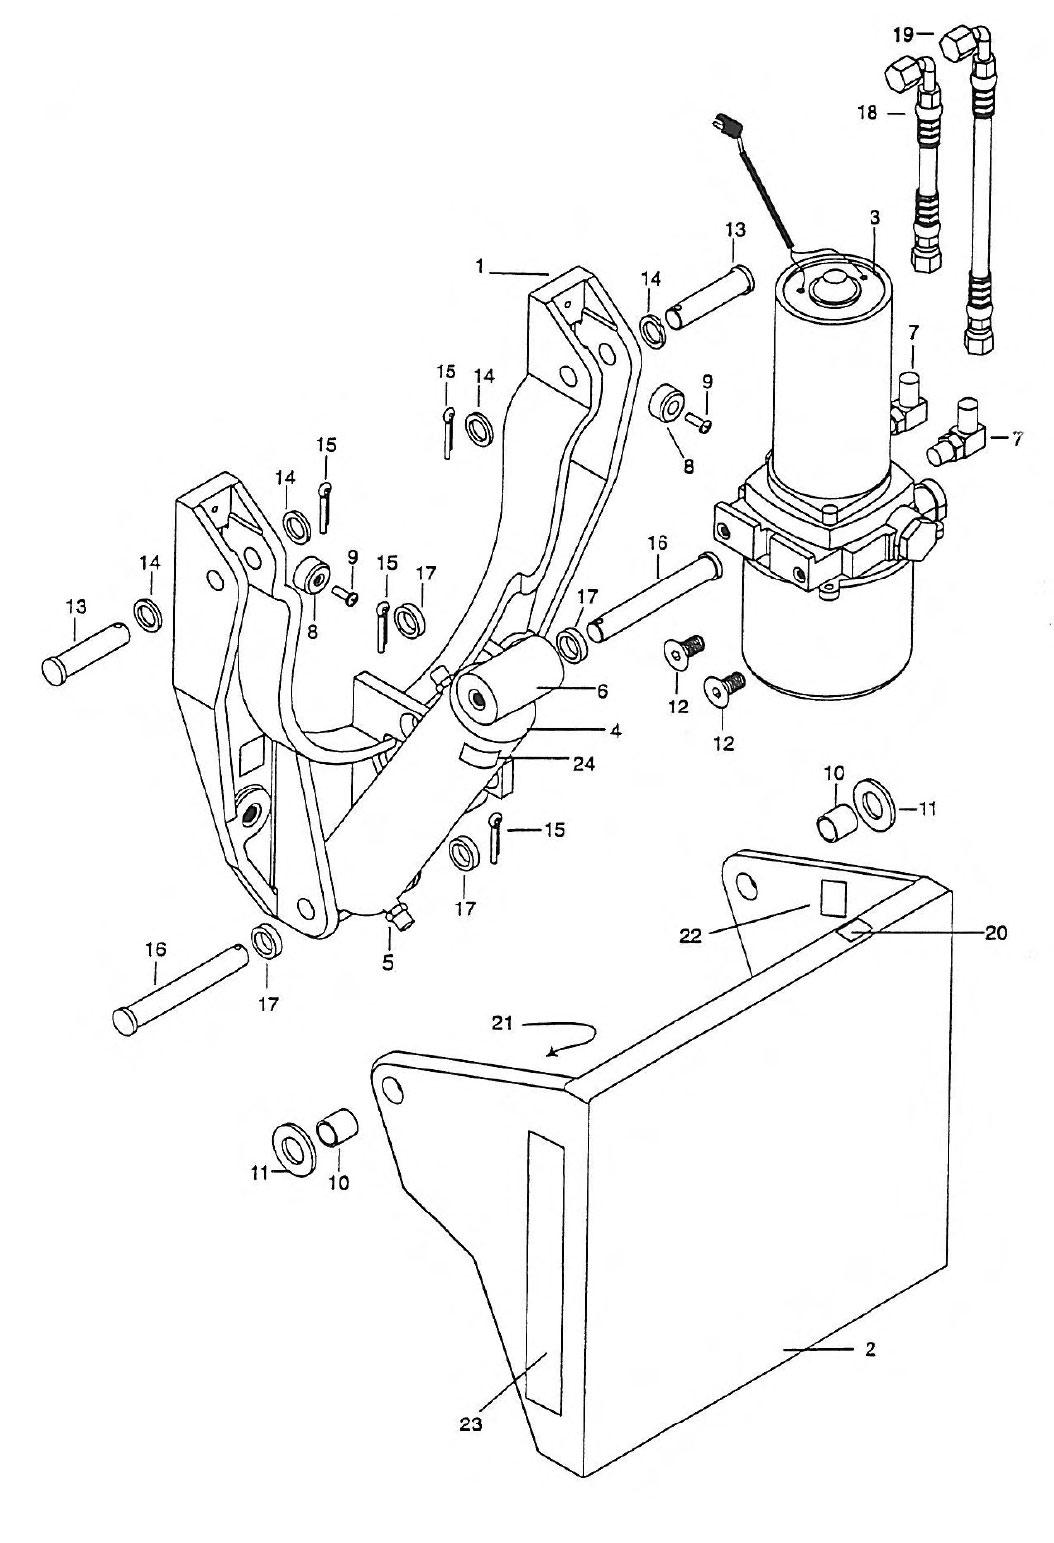 infiniti g35 coupe wiring diagram html infiniti car wiring diagrams manuals